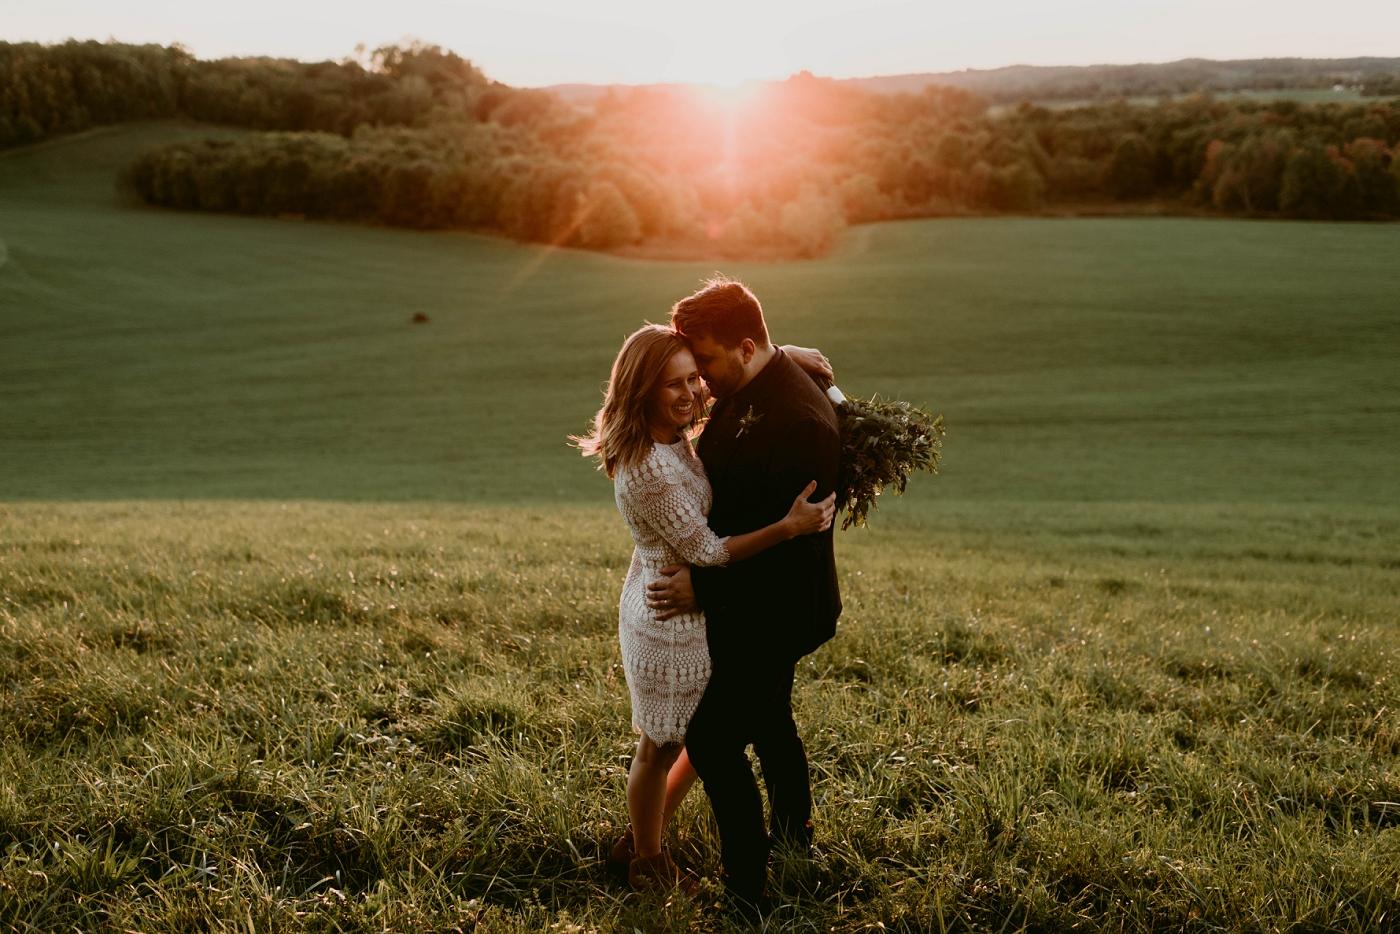 Wildflower-Field-Elopement-Vow-Renewal_Lisa+Chad_MJPHOTO-272.JPG